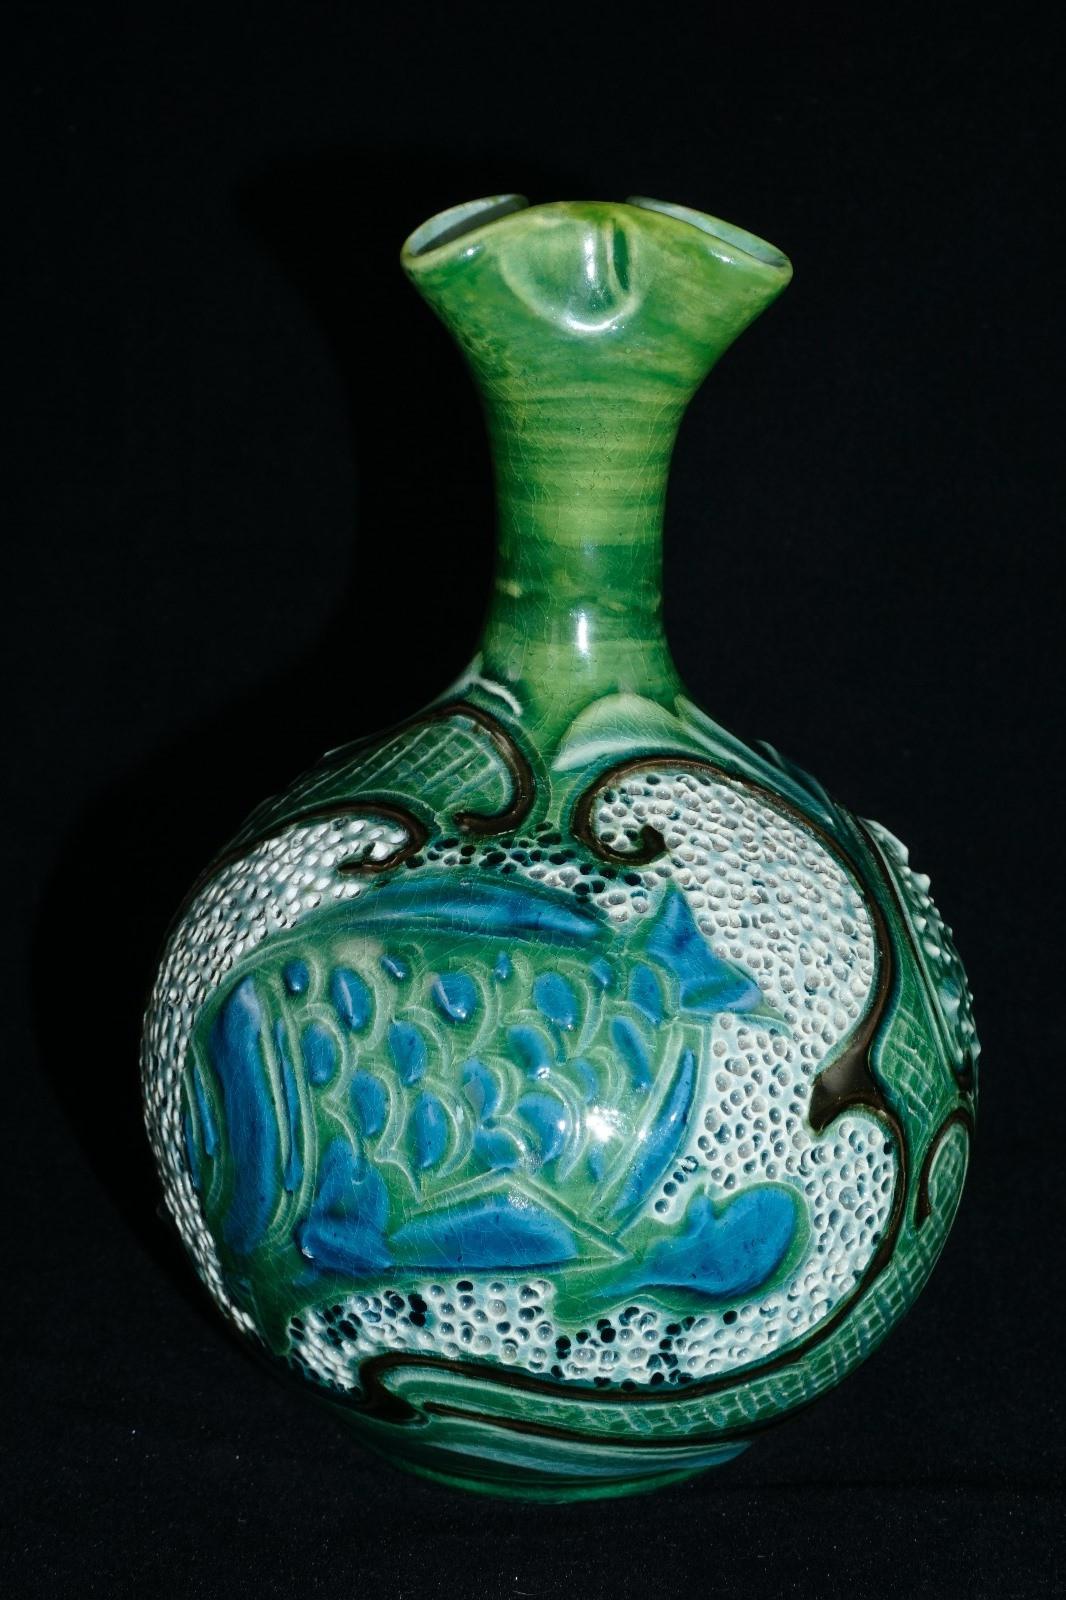 florian ware vase of delightful c h brannam barum ware fish vase by frederick baron of pertaining to delightful c h brannam barum ware fish vase by frederick baron of barnstaple 1898